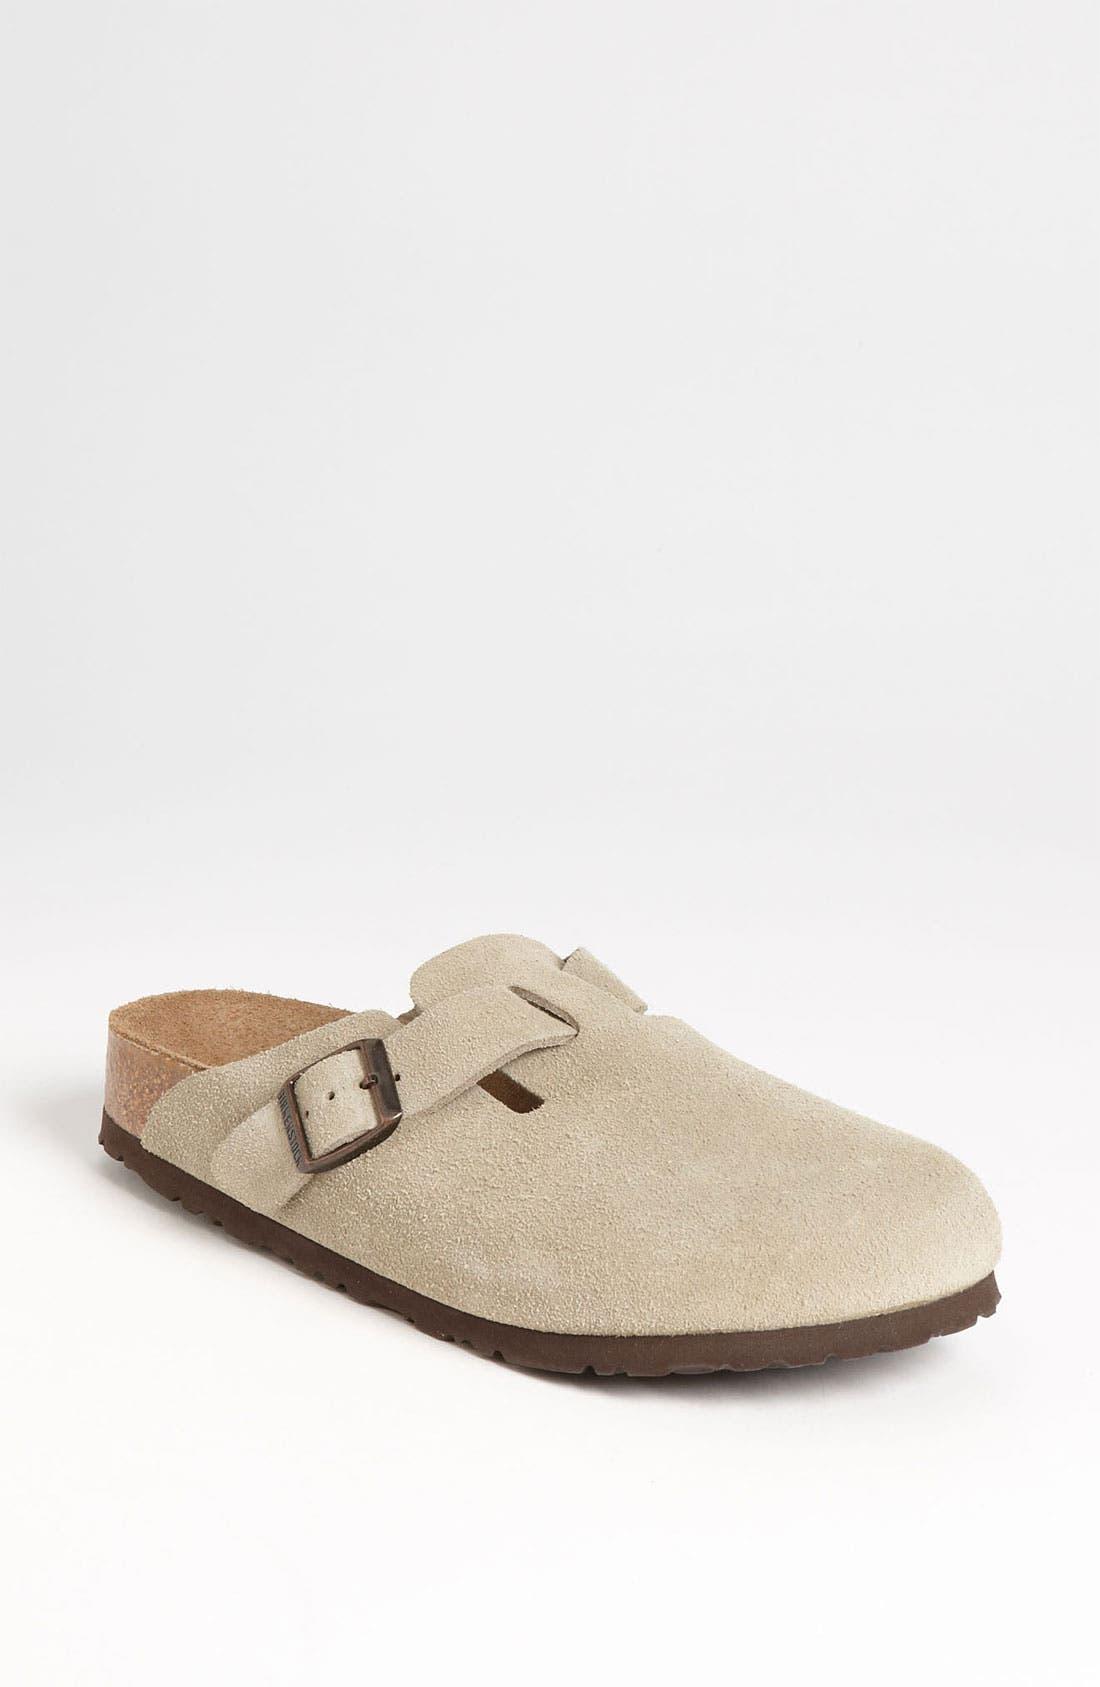 Main Image - Birkenstock 'Boston' Soft Footbed Clog (Women)